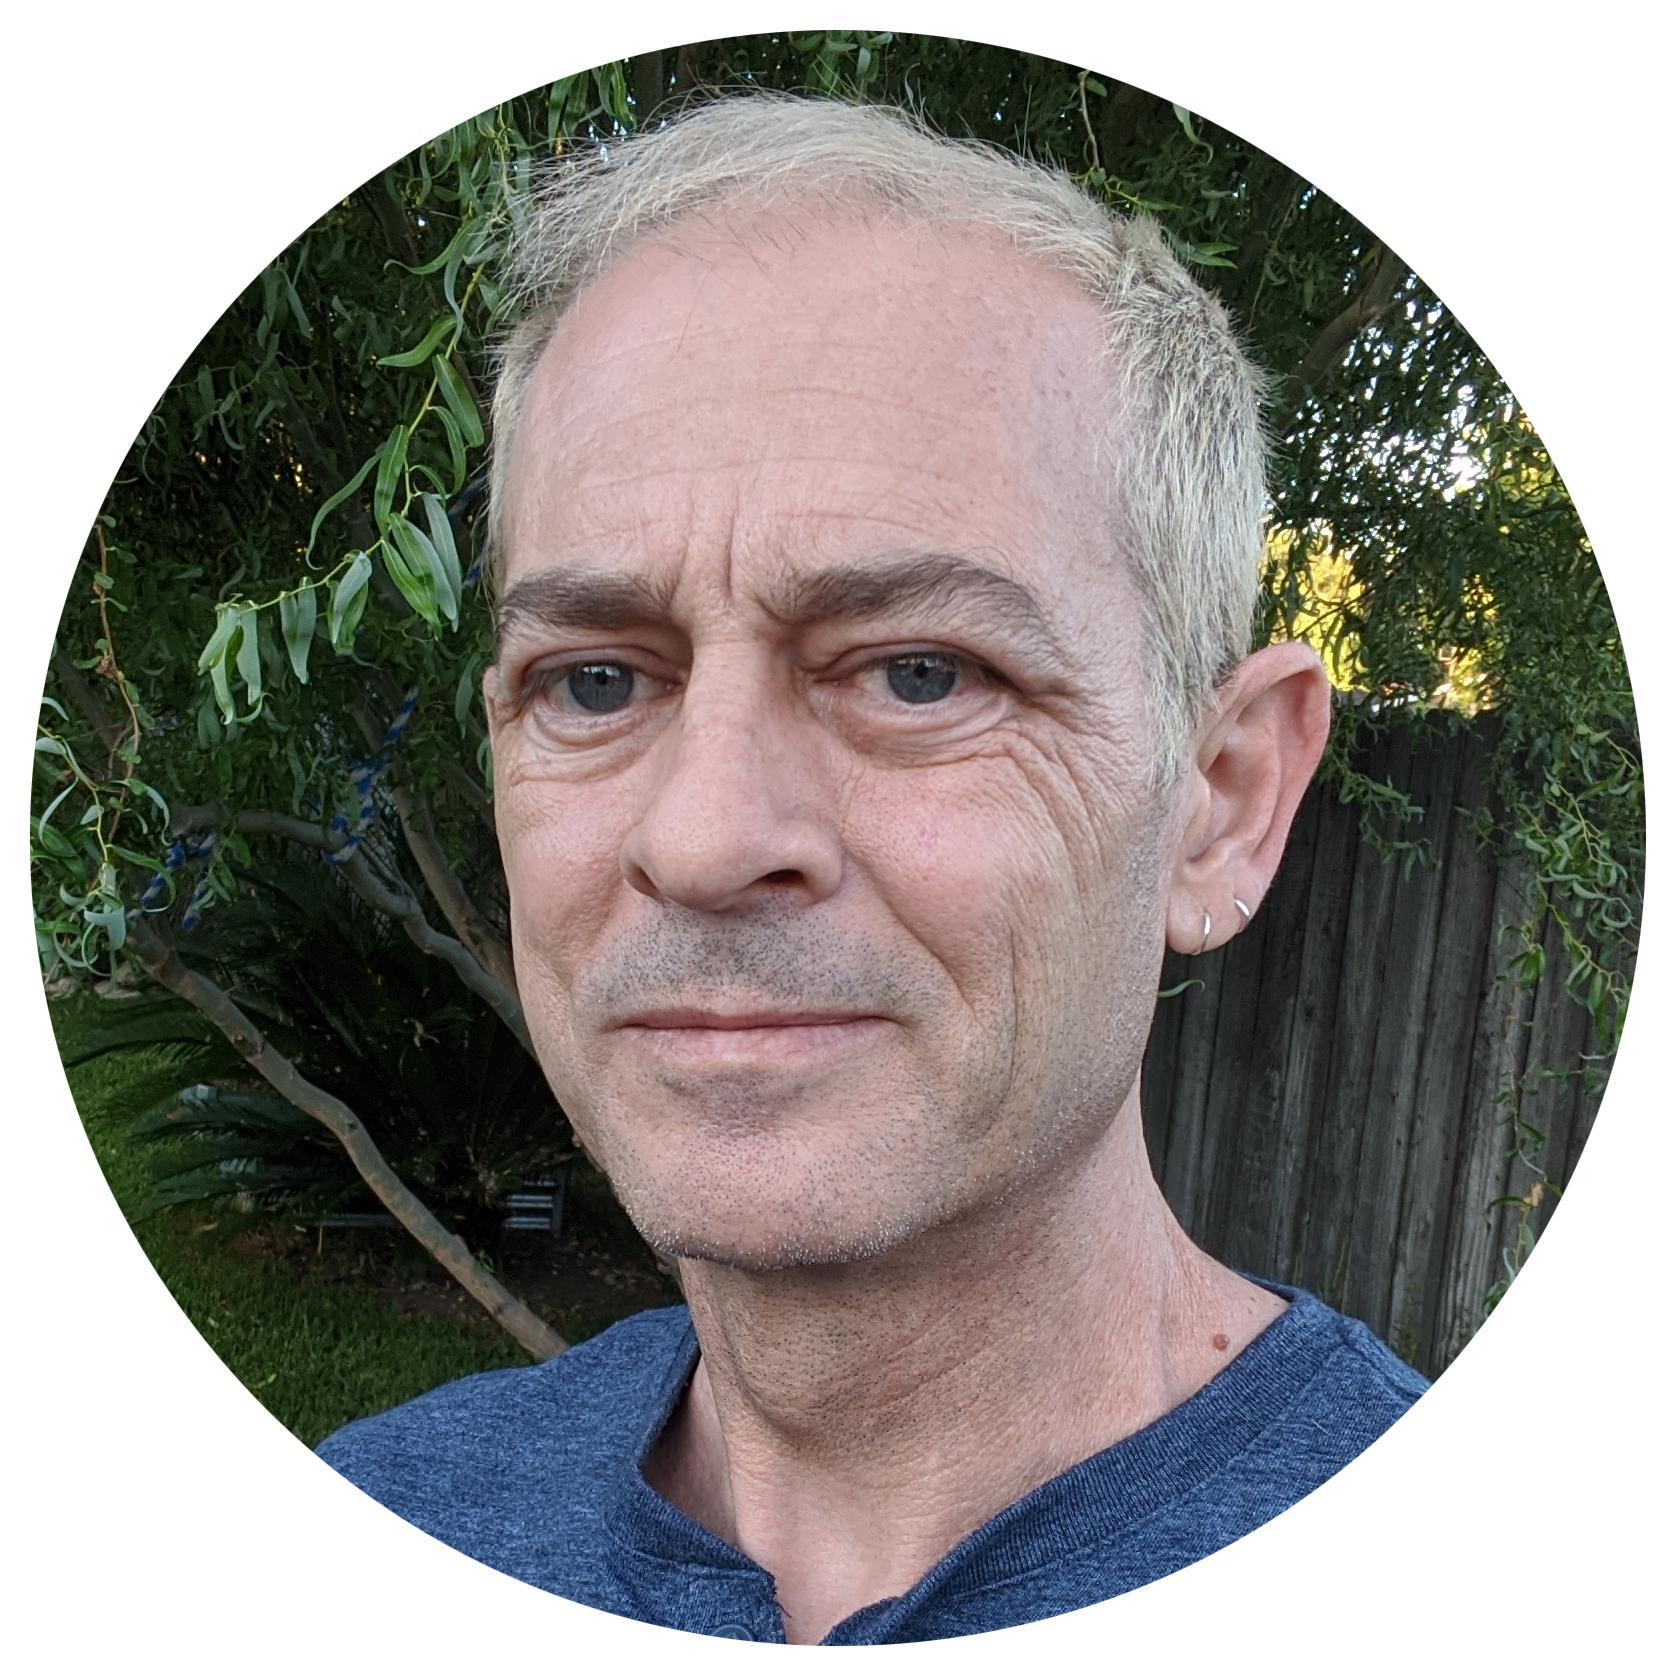 Headshot of Greg Chisholm